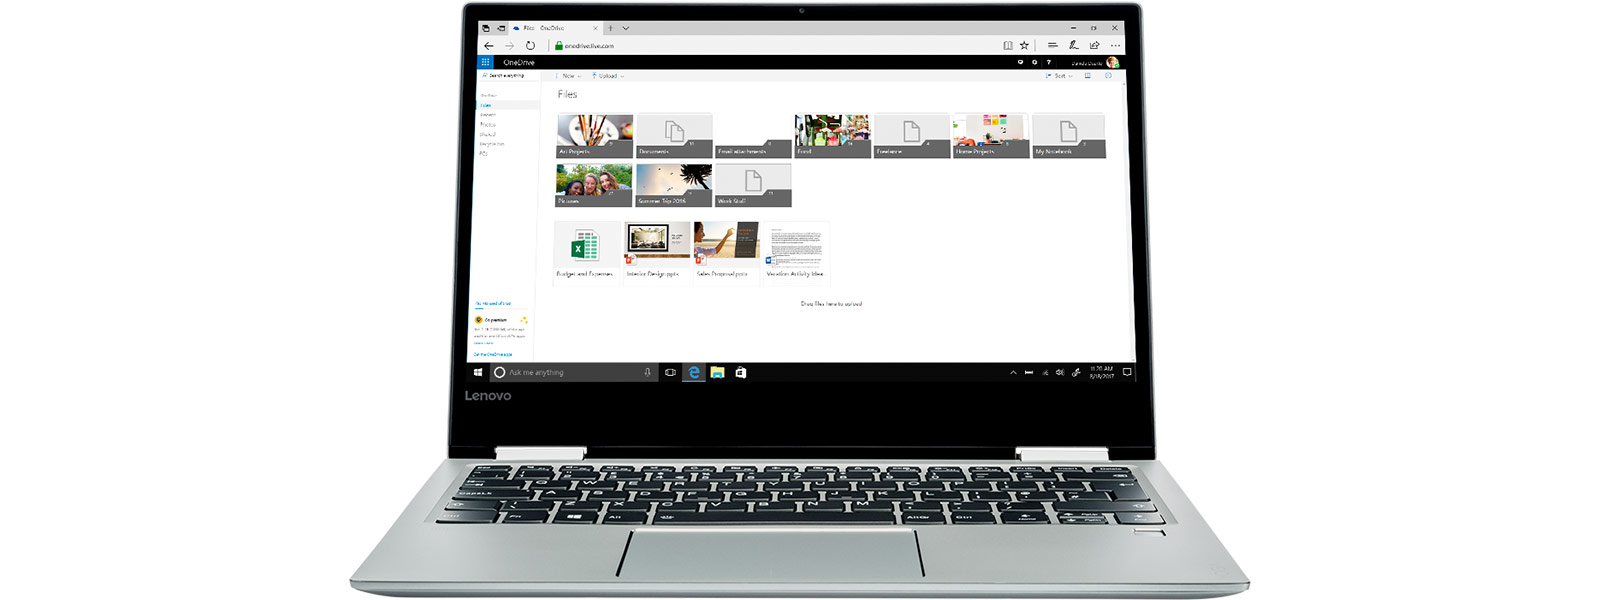 OneDrive screen on a Windows 10 device